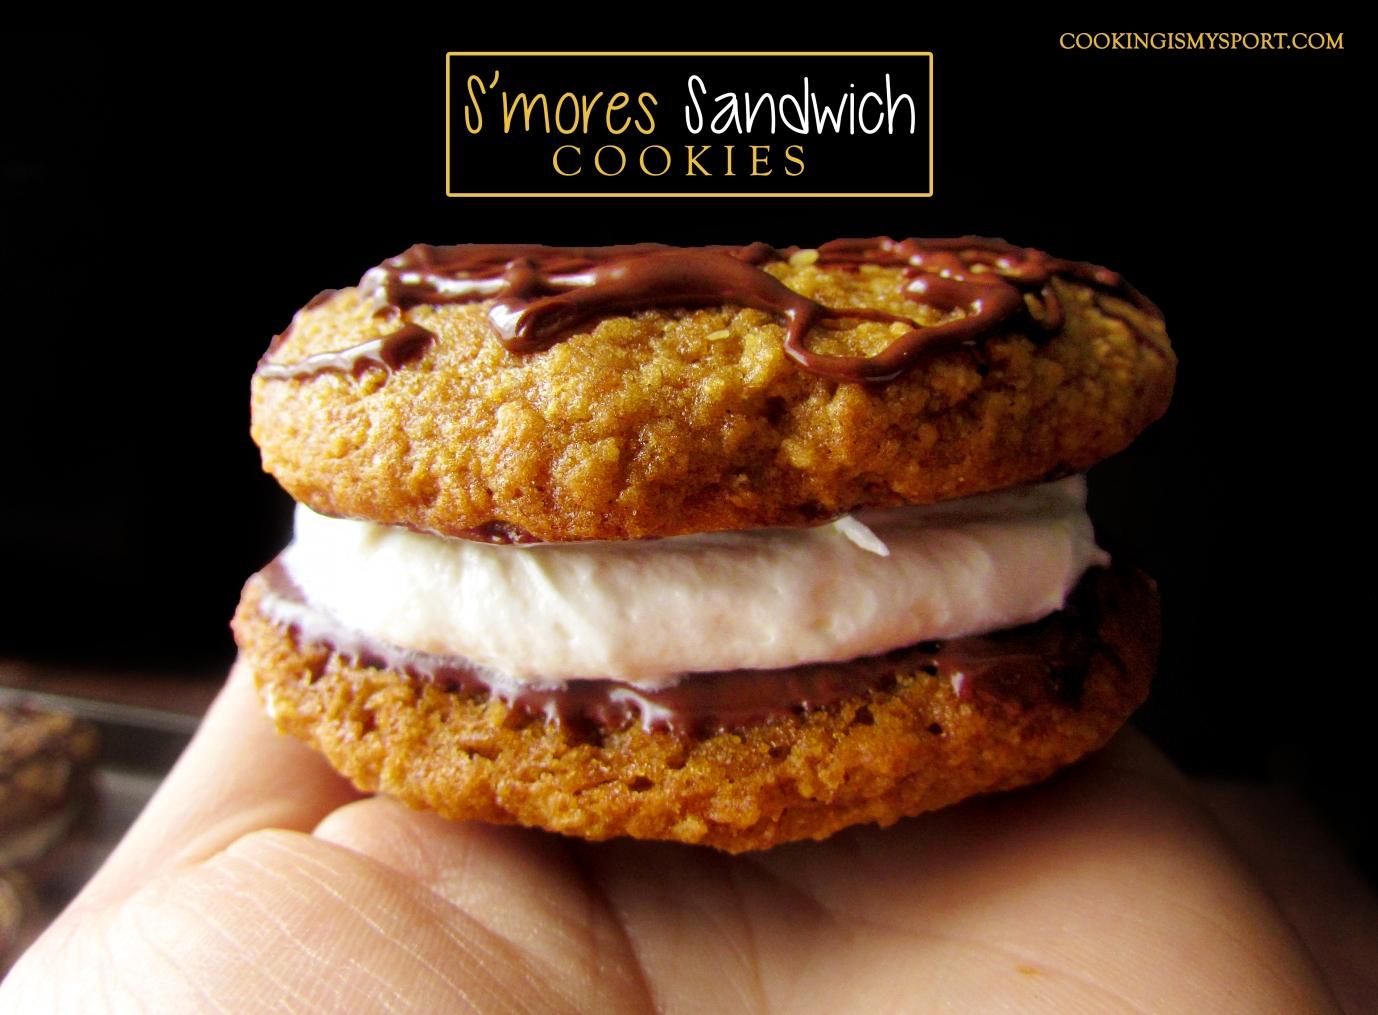 S'mores Sandwich Cookies3